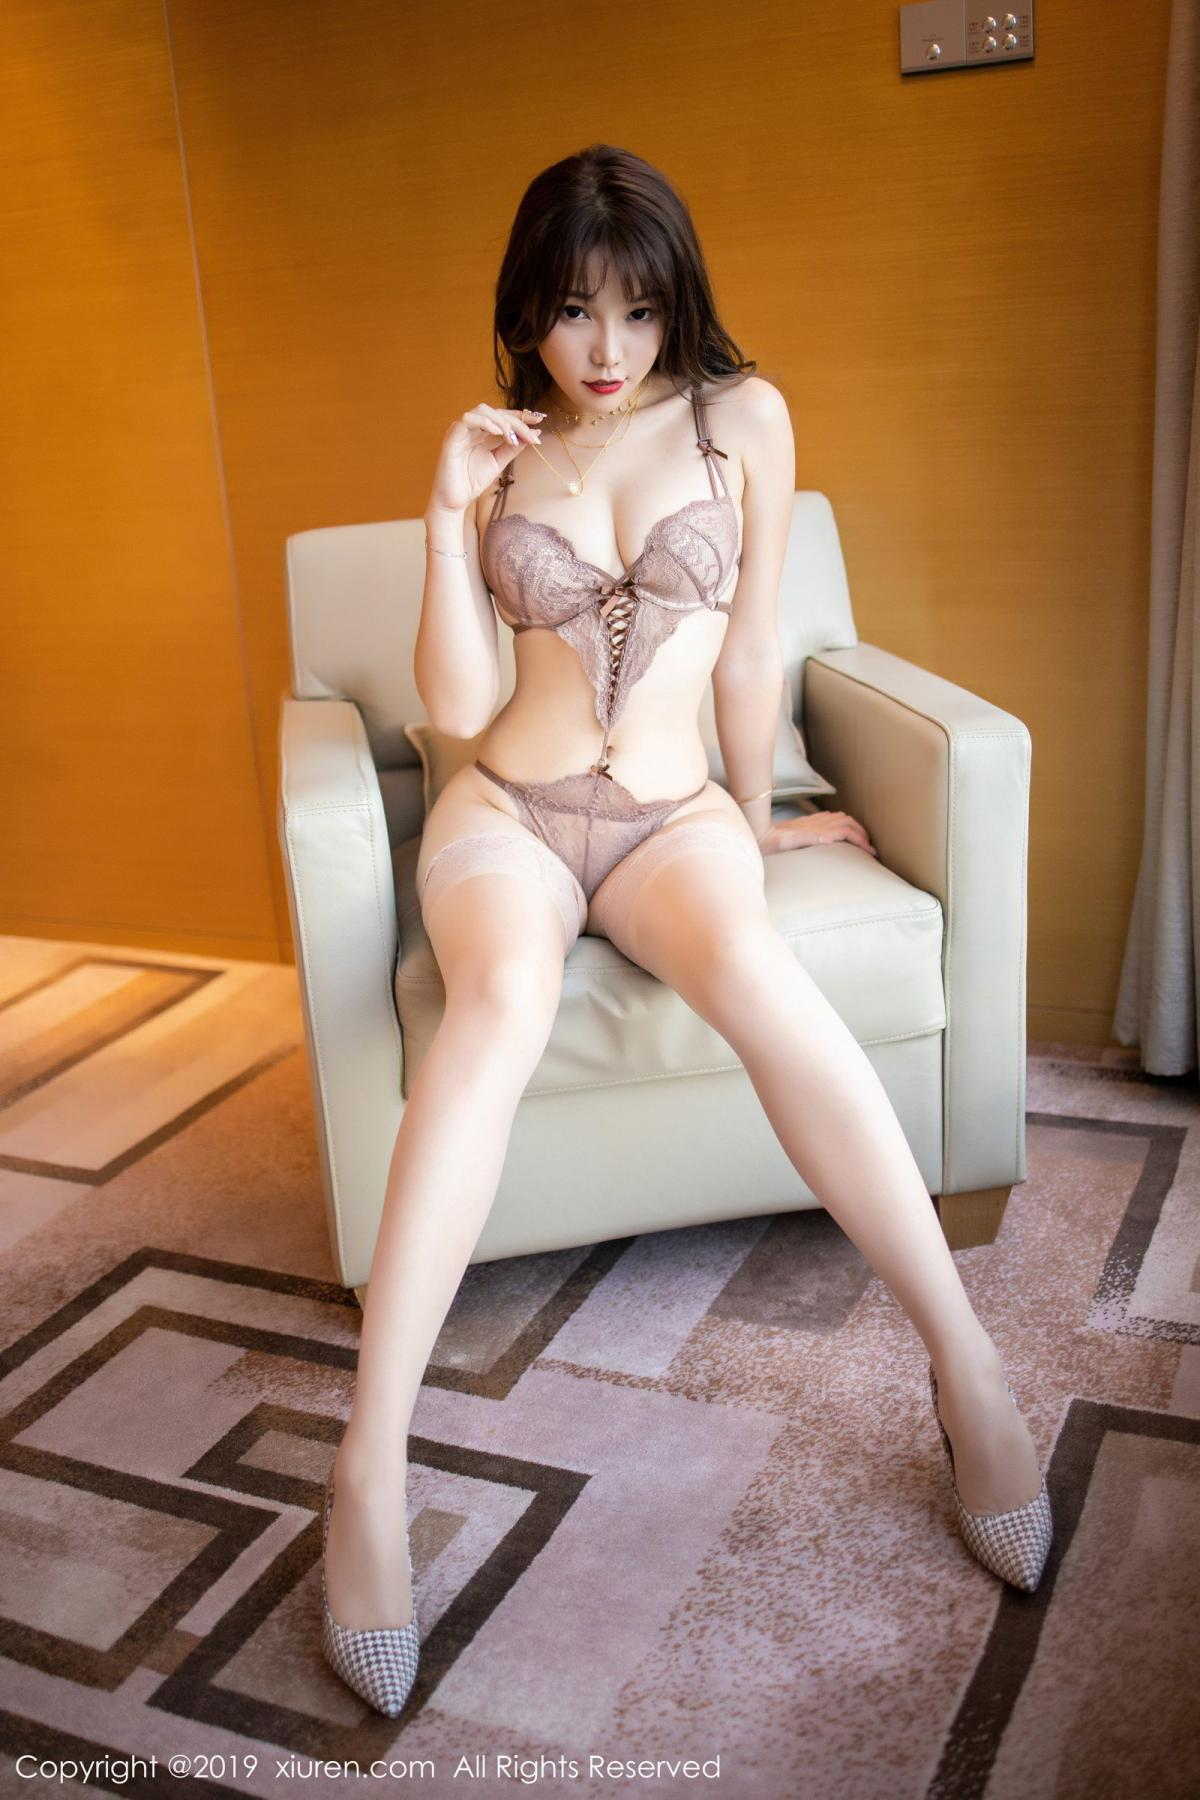 [XiuRen] Vol.1675 Chen Zhi 37P, Chen Zhi, Cheongsam, Tall, Underwear, Xiuren